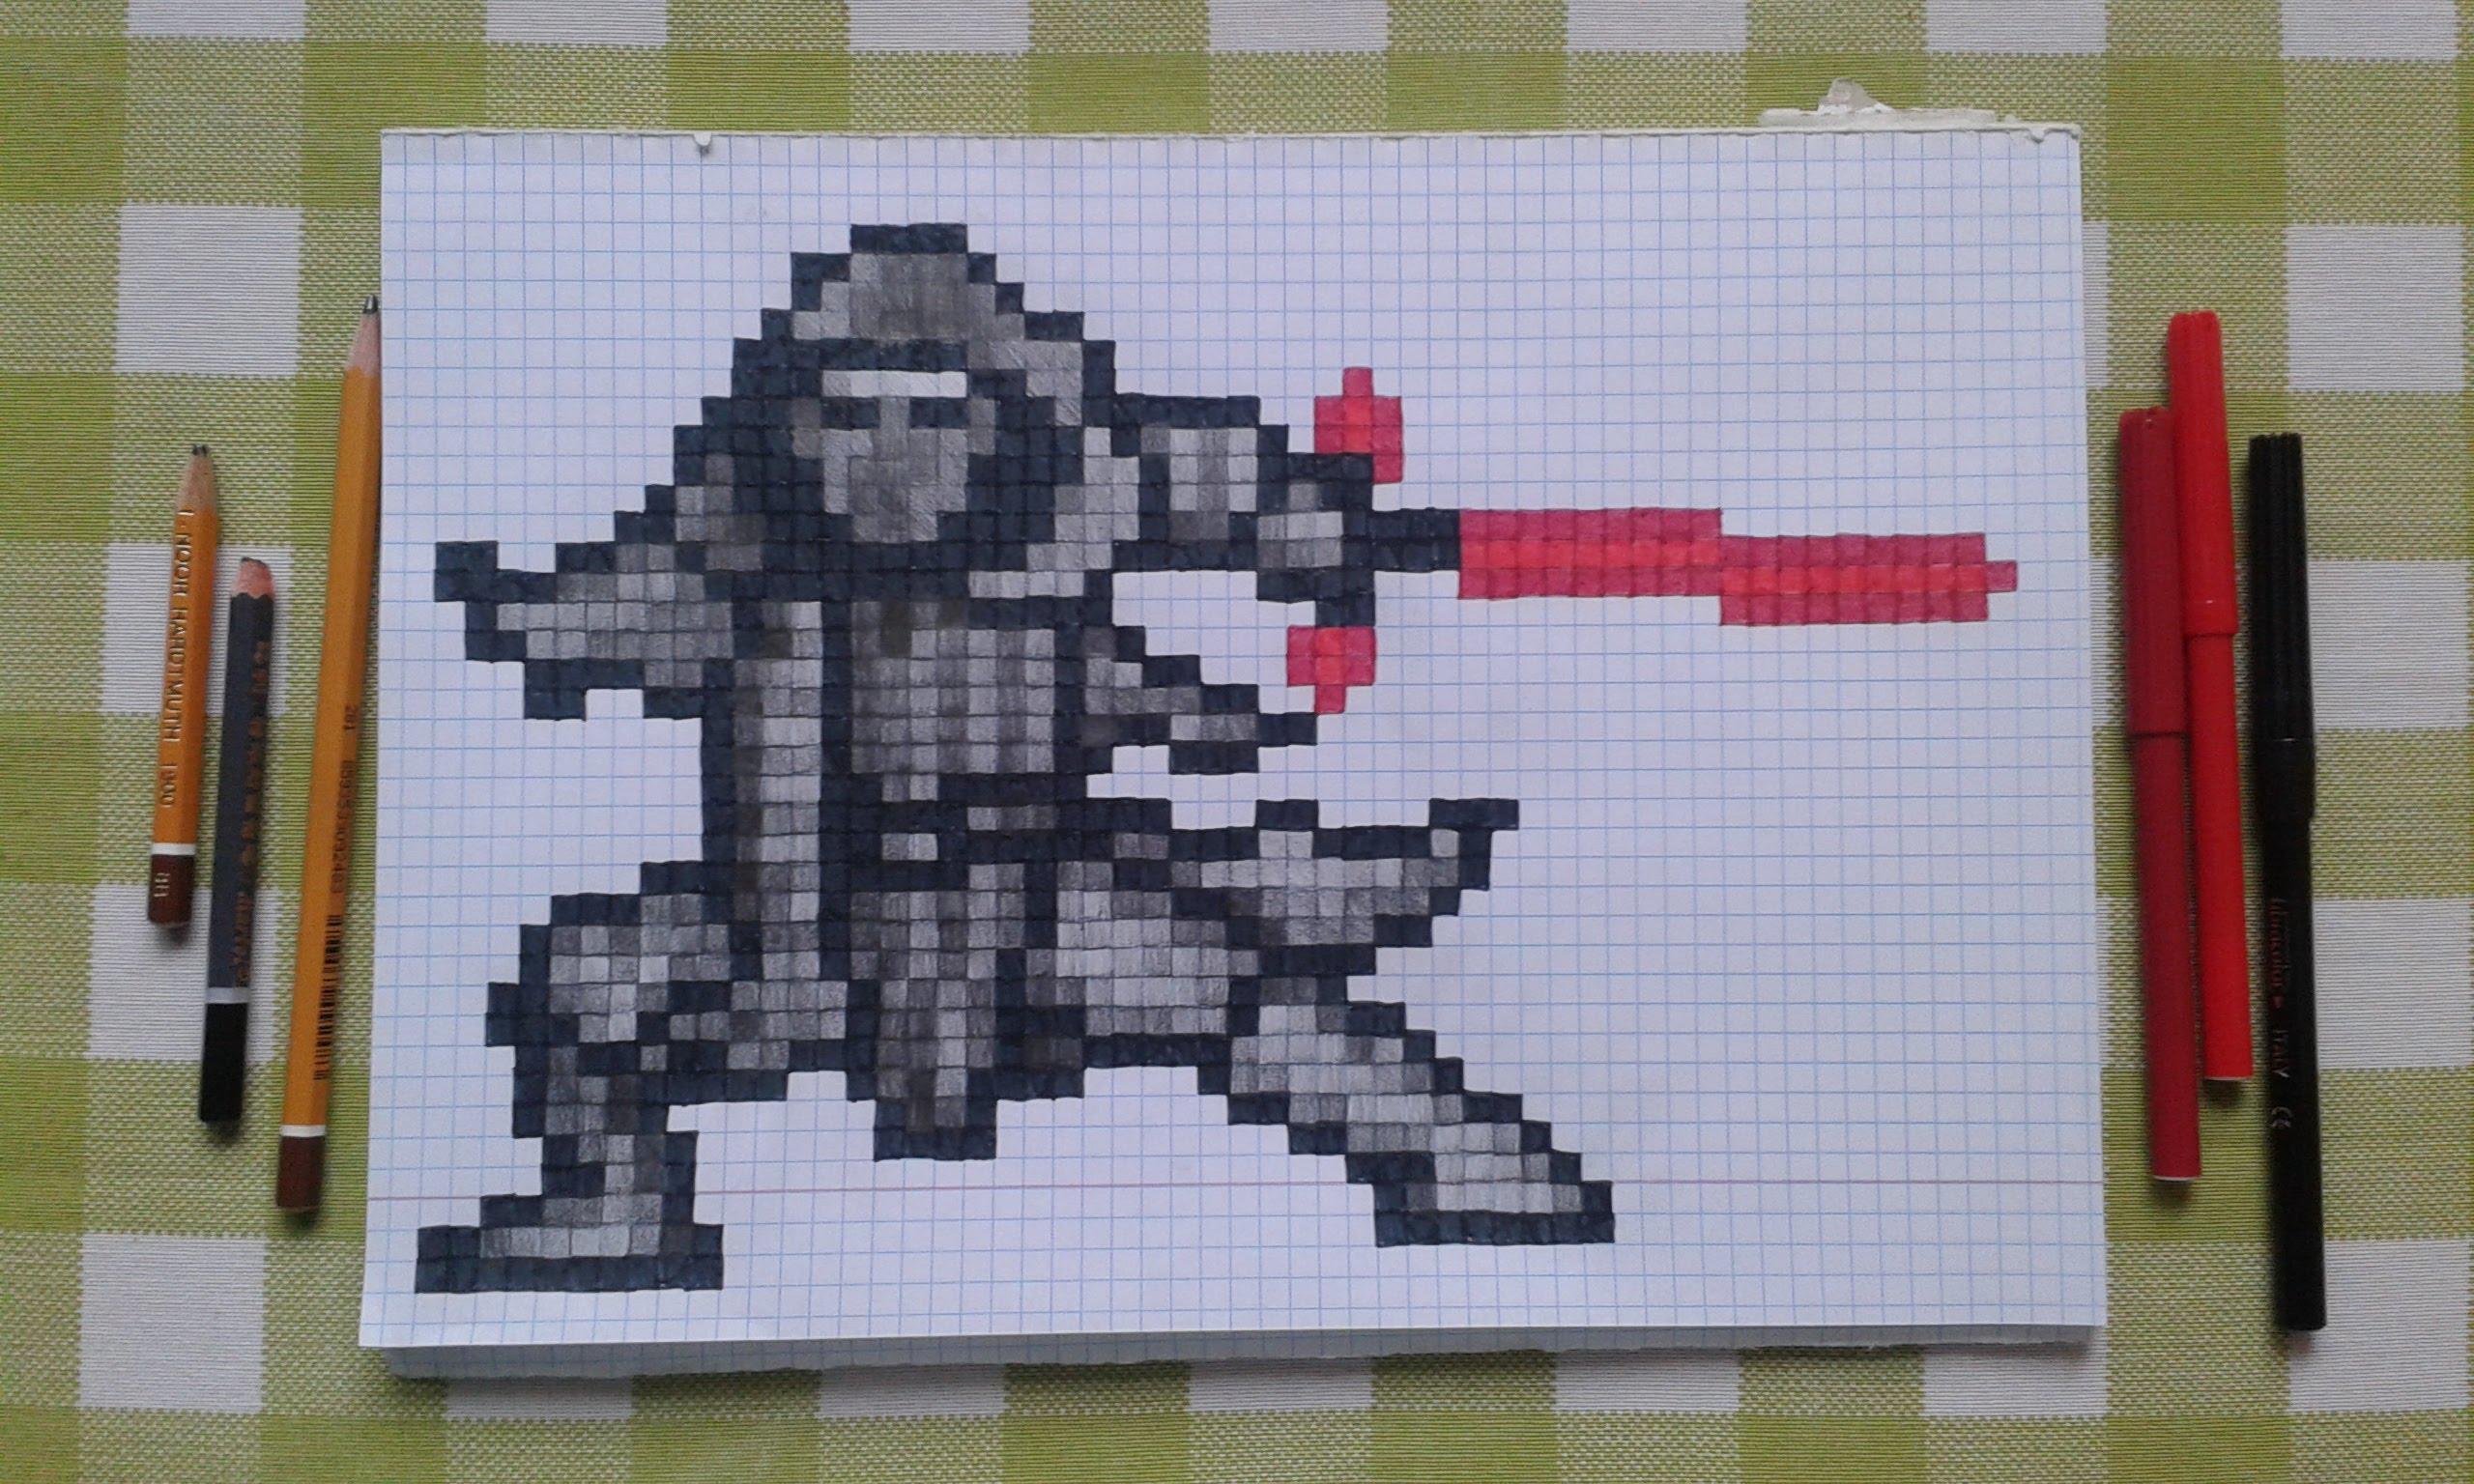 Drawn pixel art minecraft Pixel Speed Awakens Pixel Wars